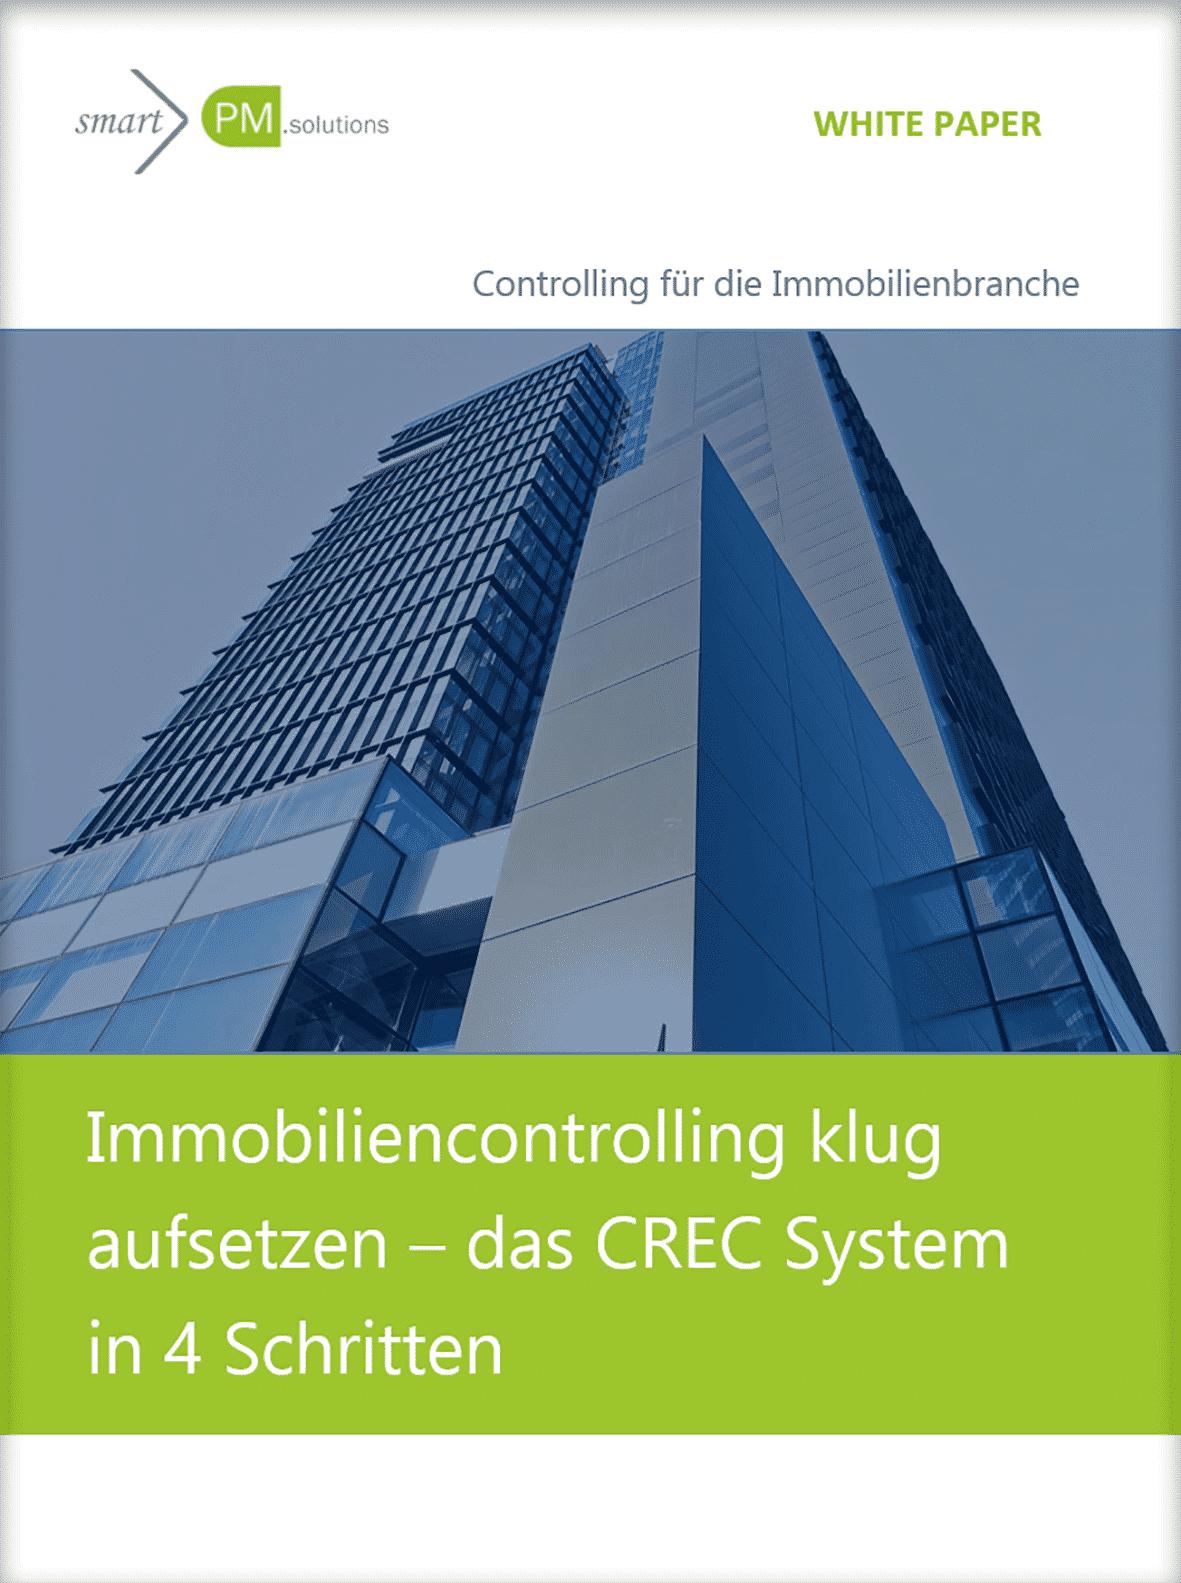 Whitepaper Immobiliencontrolling CRECS de smartPM.solutions